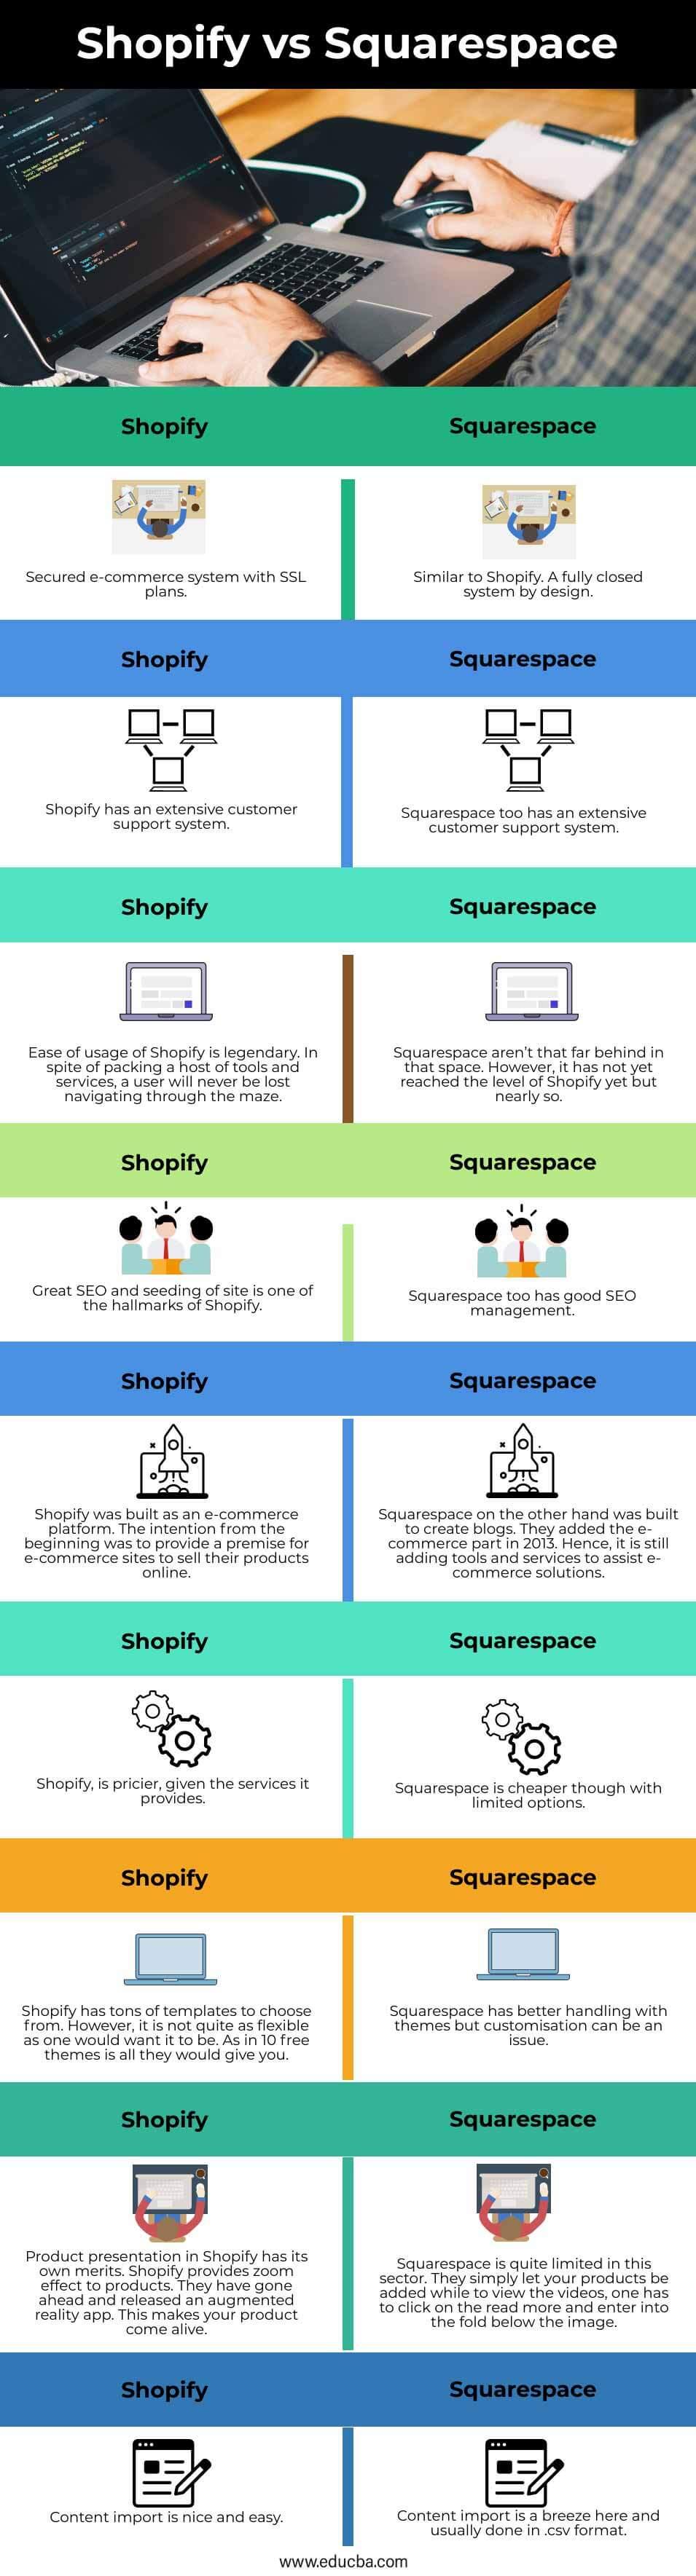 Shopify-vs-Squarespace-info